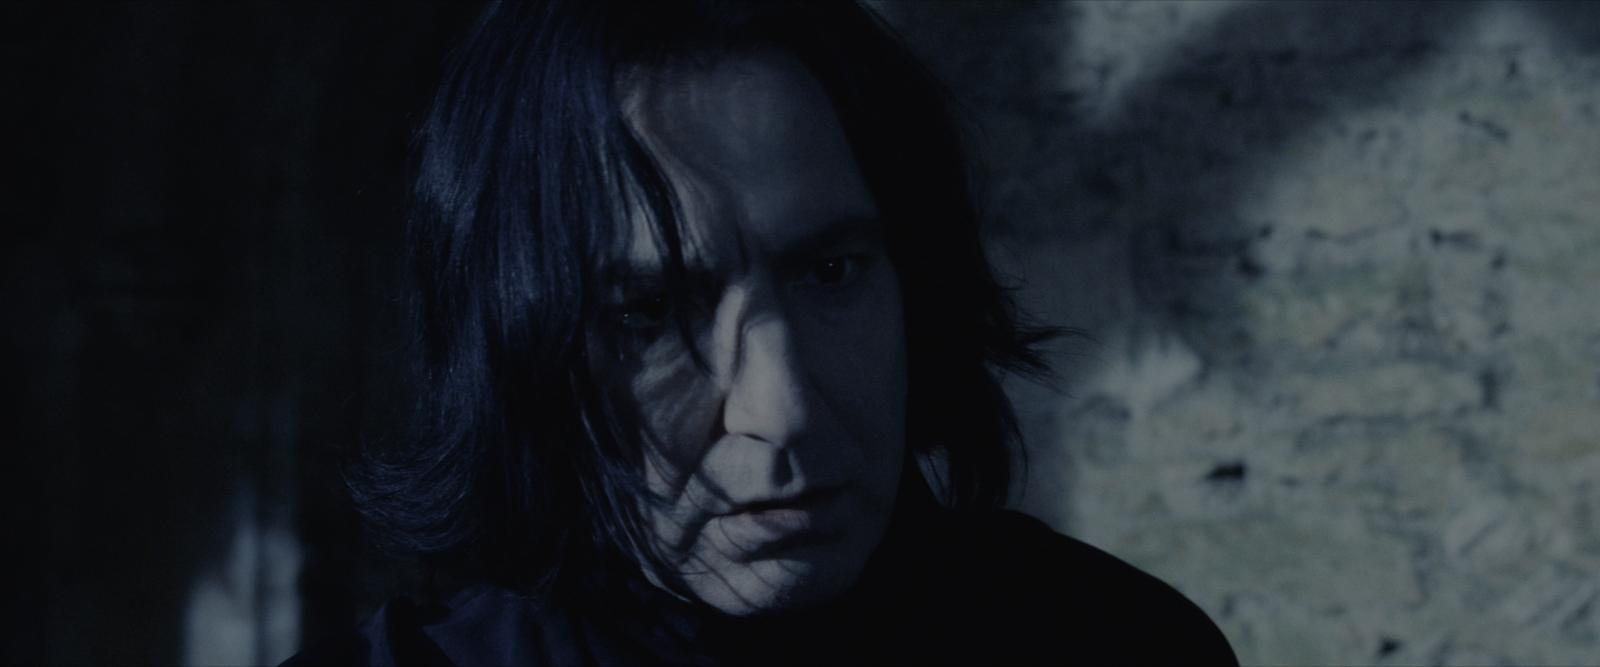 Harry Potter y la Piedra Filosofal (2001) 4K UHD [HDR] Latino - Castellano - Ingles captura 3